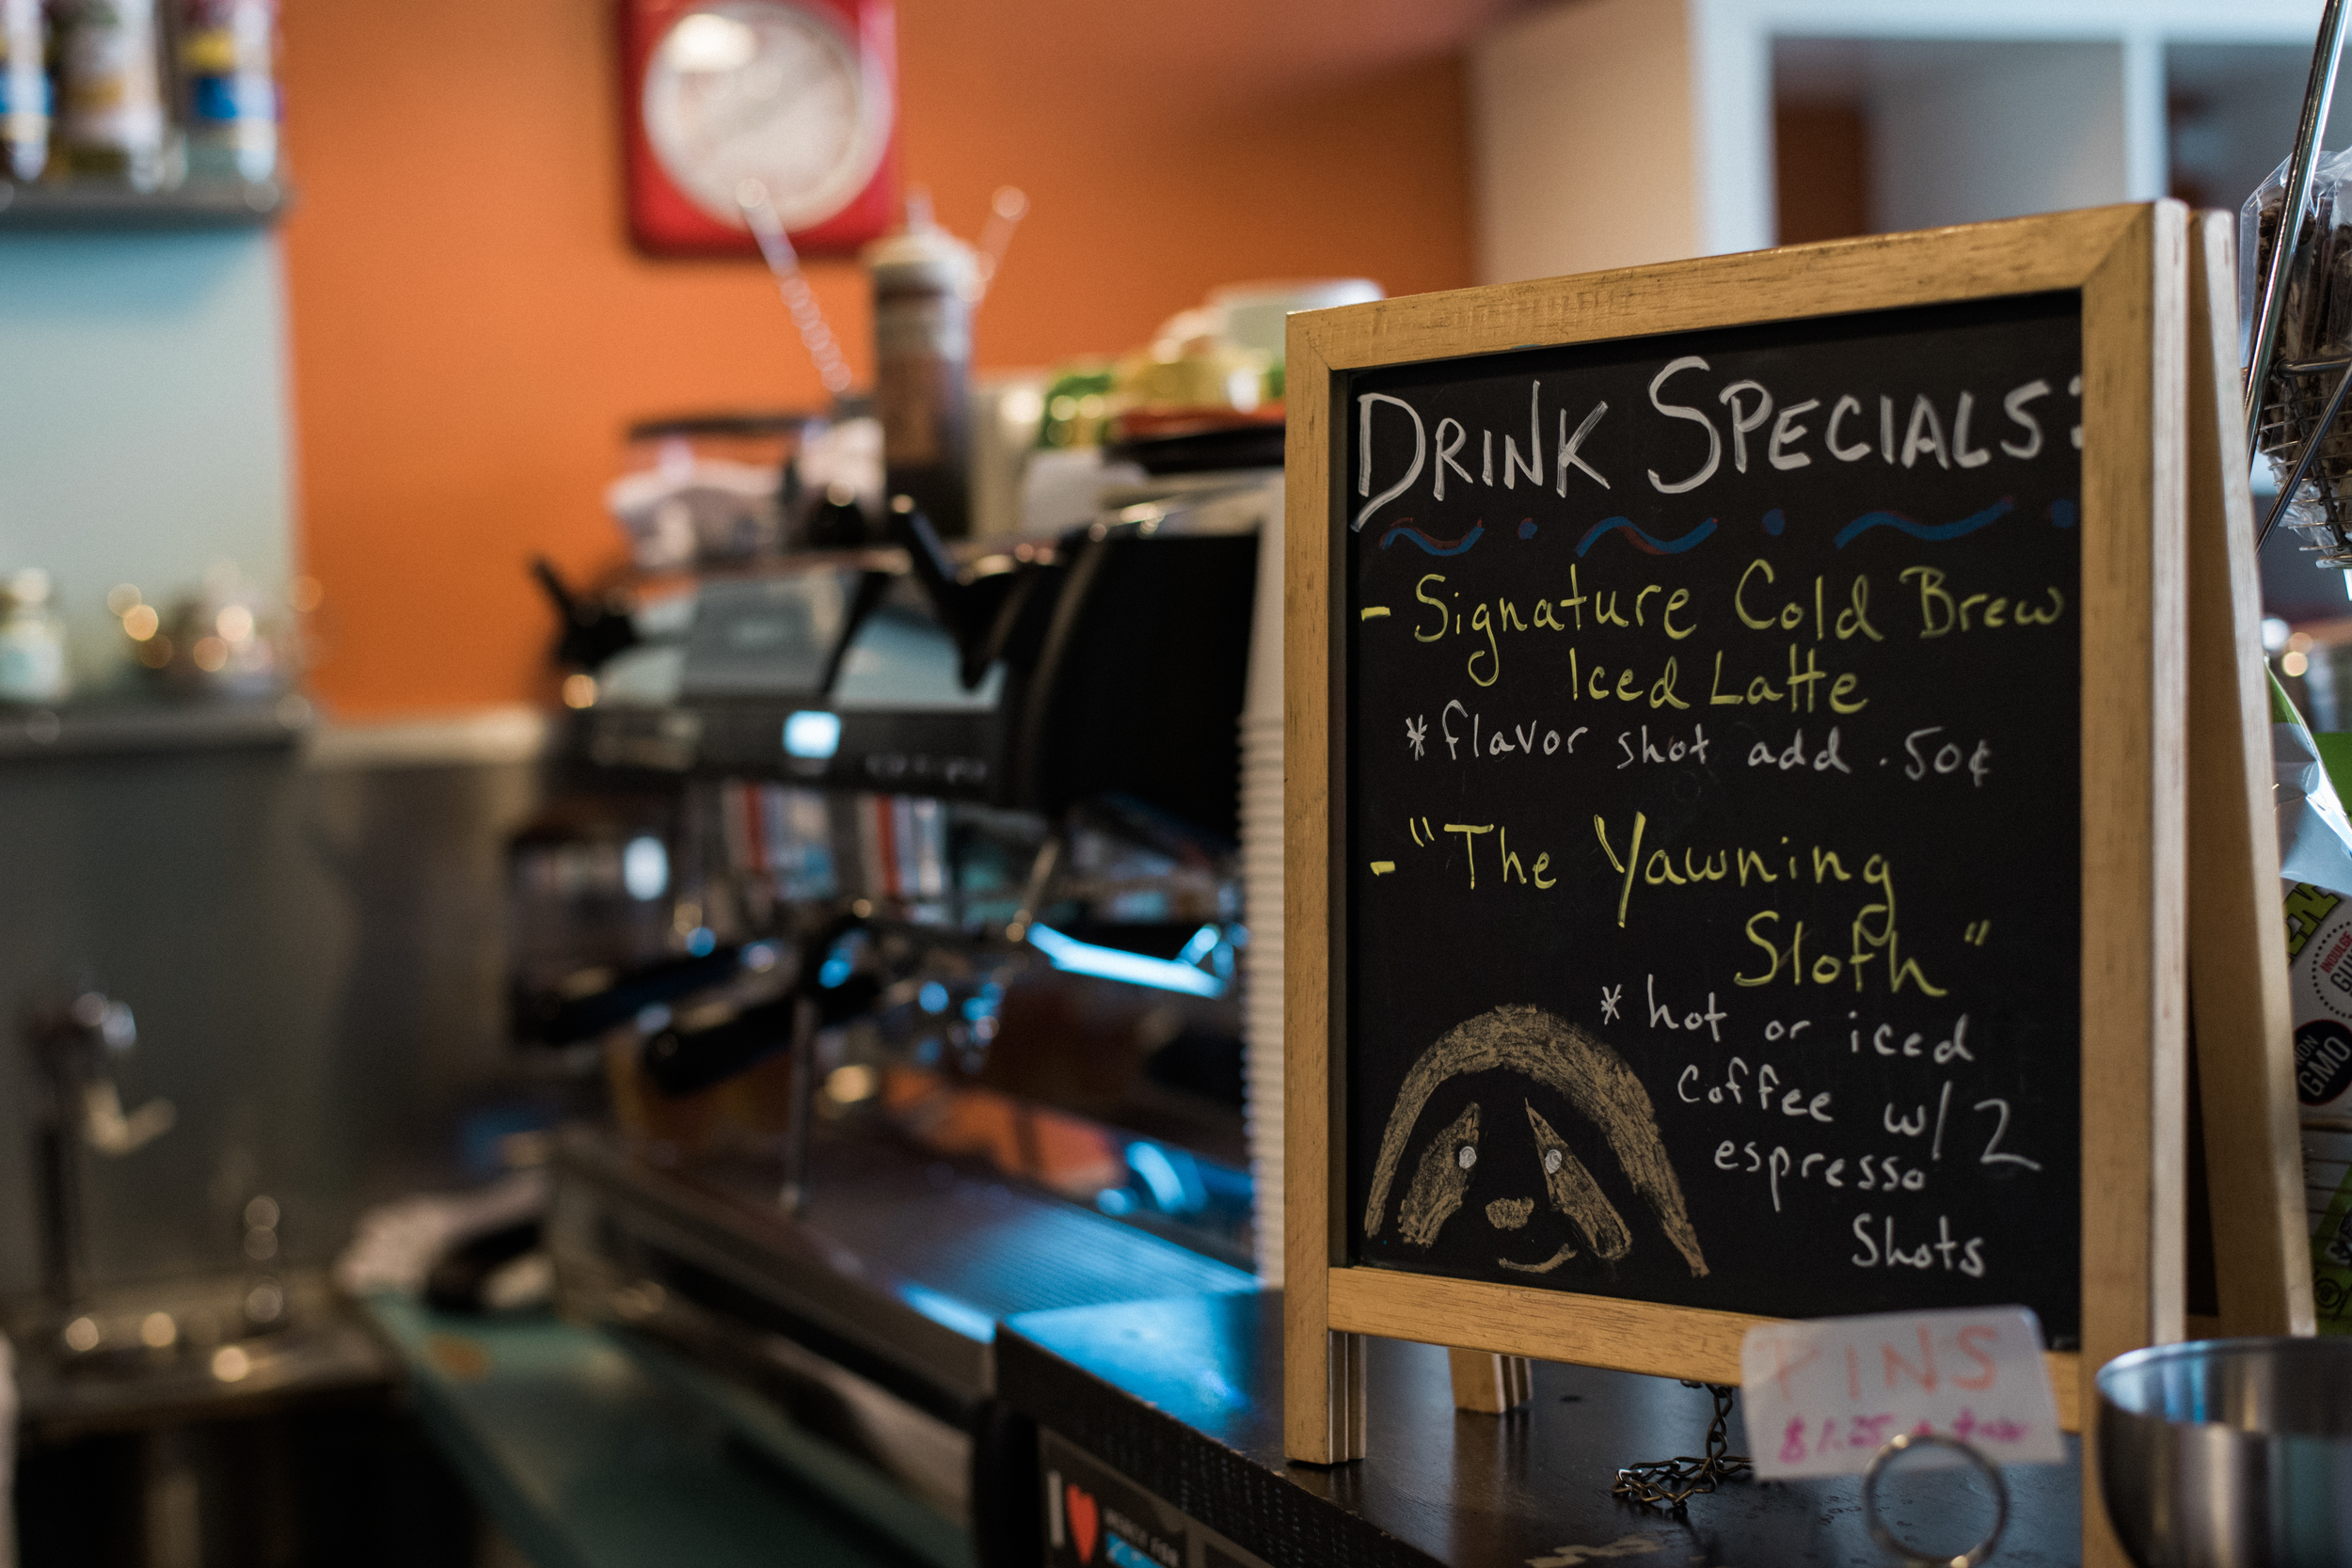 chelsea-bliefernicht-chicago-il-coffee-shop-engagement-photographer